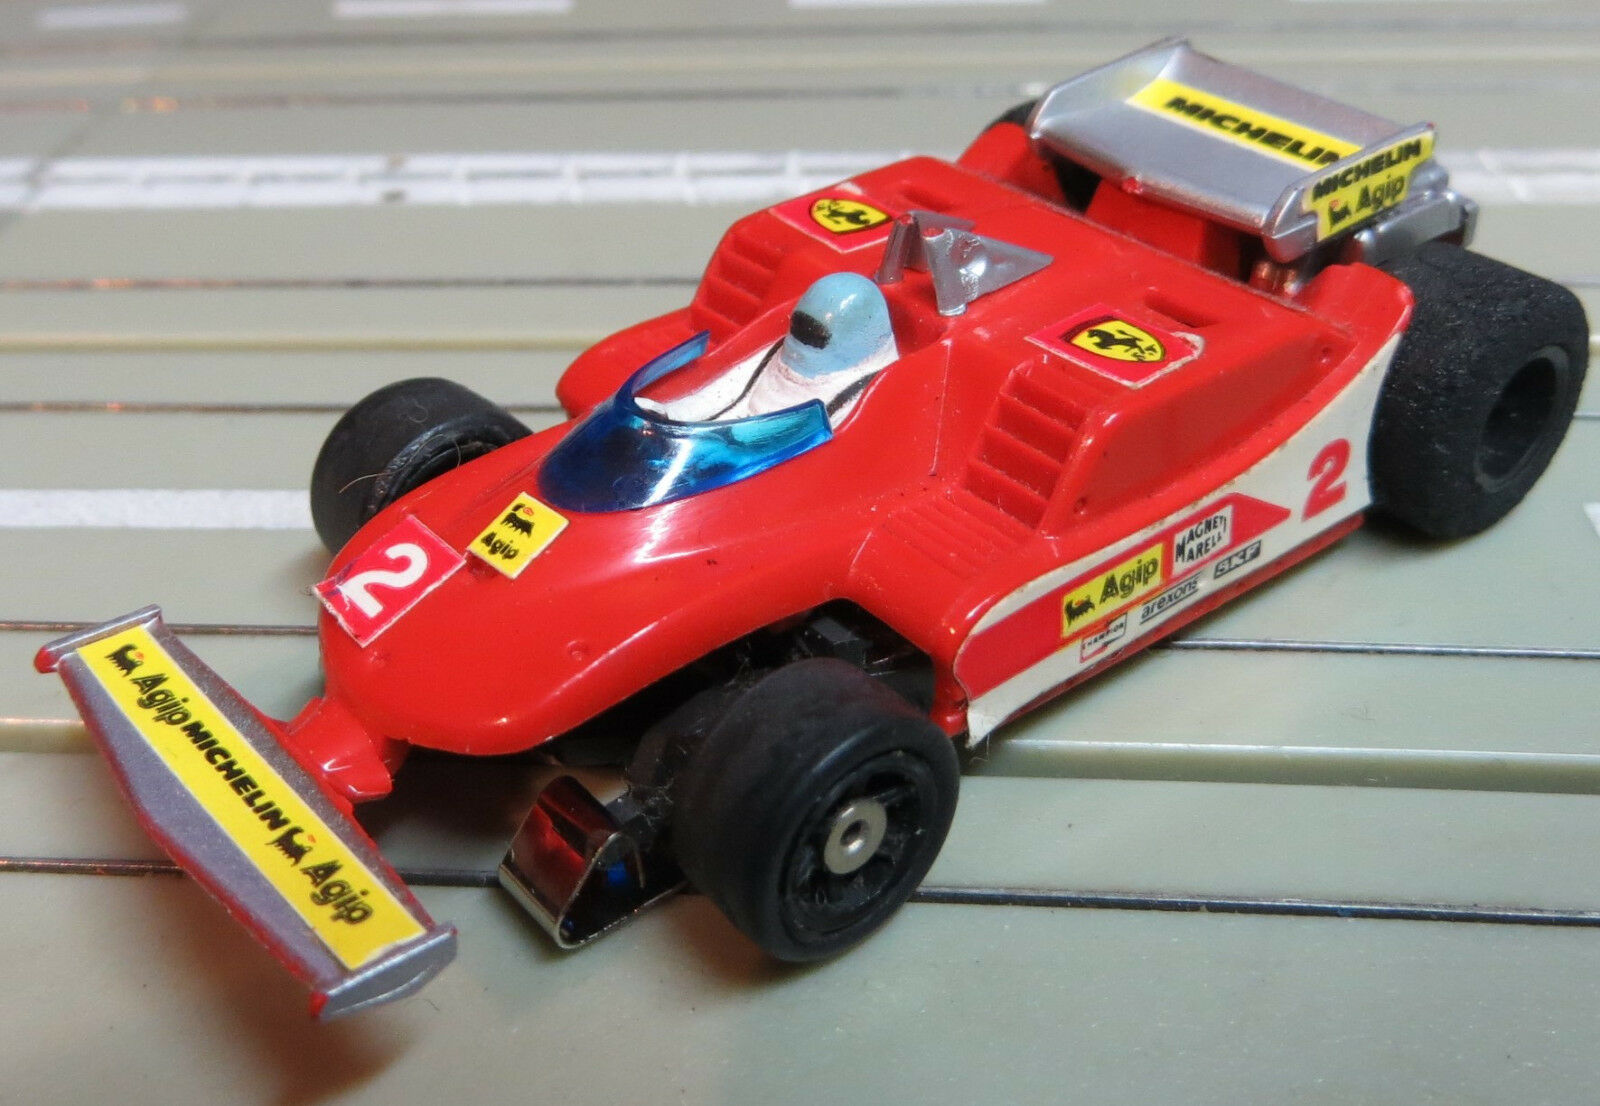 Faller Aurora - Fórmula 1 Ferrari 312 T4 T4 T4 + 2 Nuevos Ruedas Traseras  marca